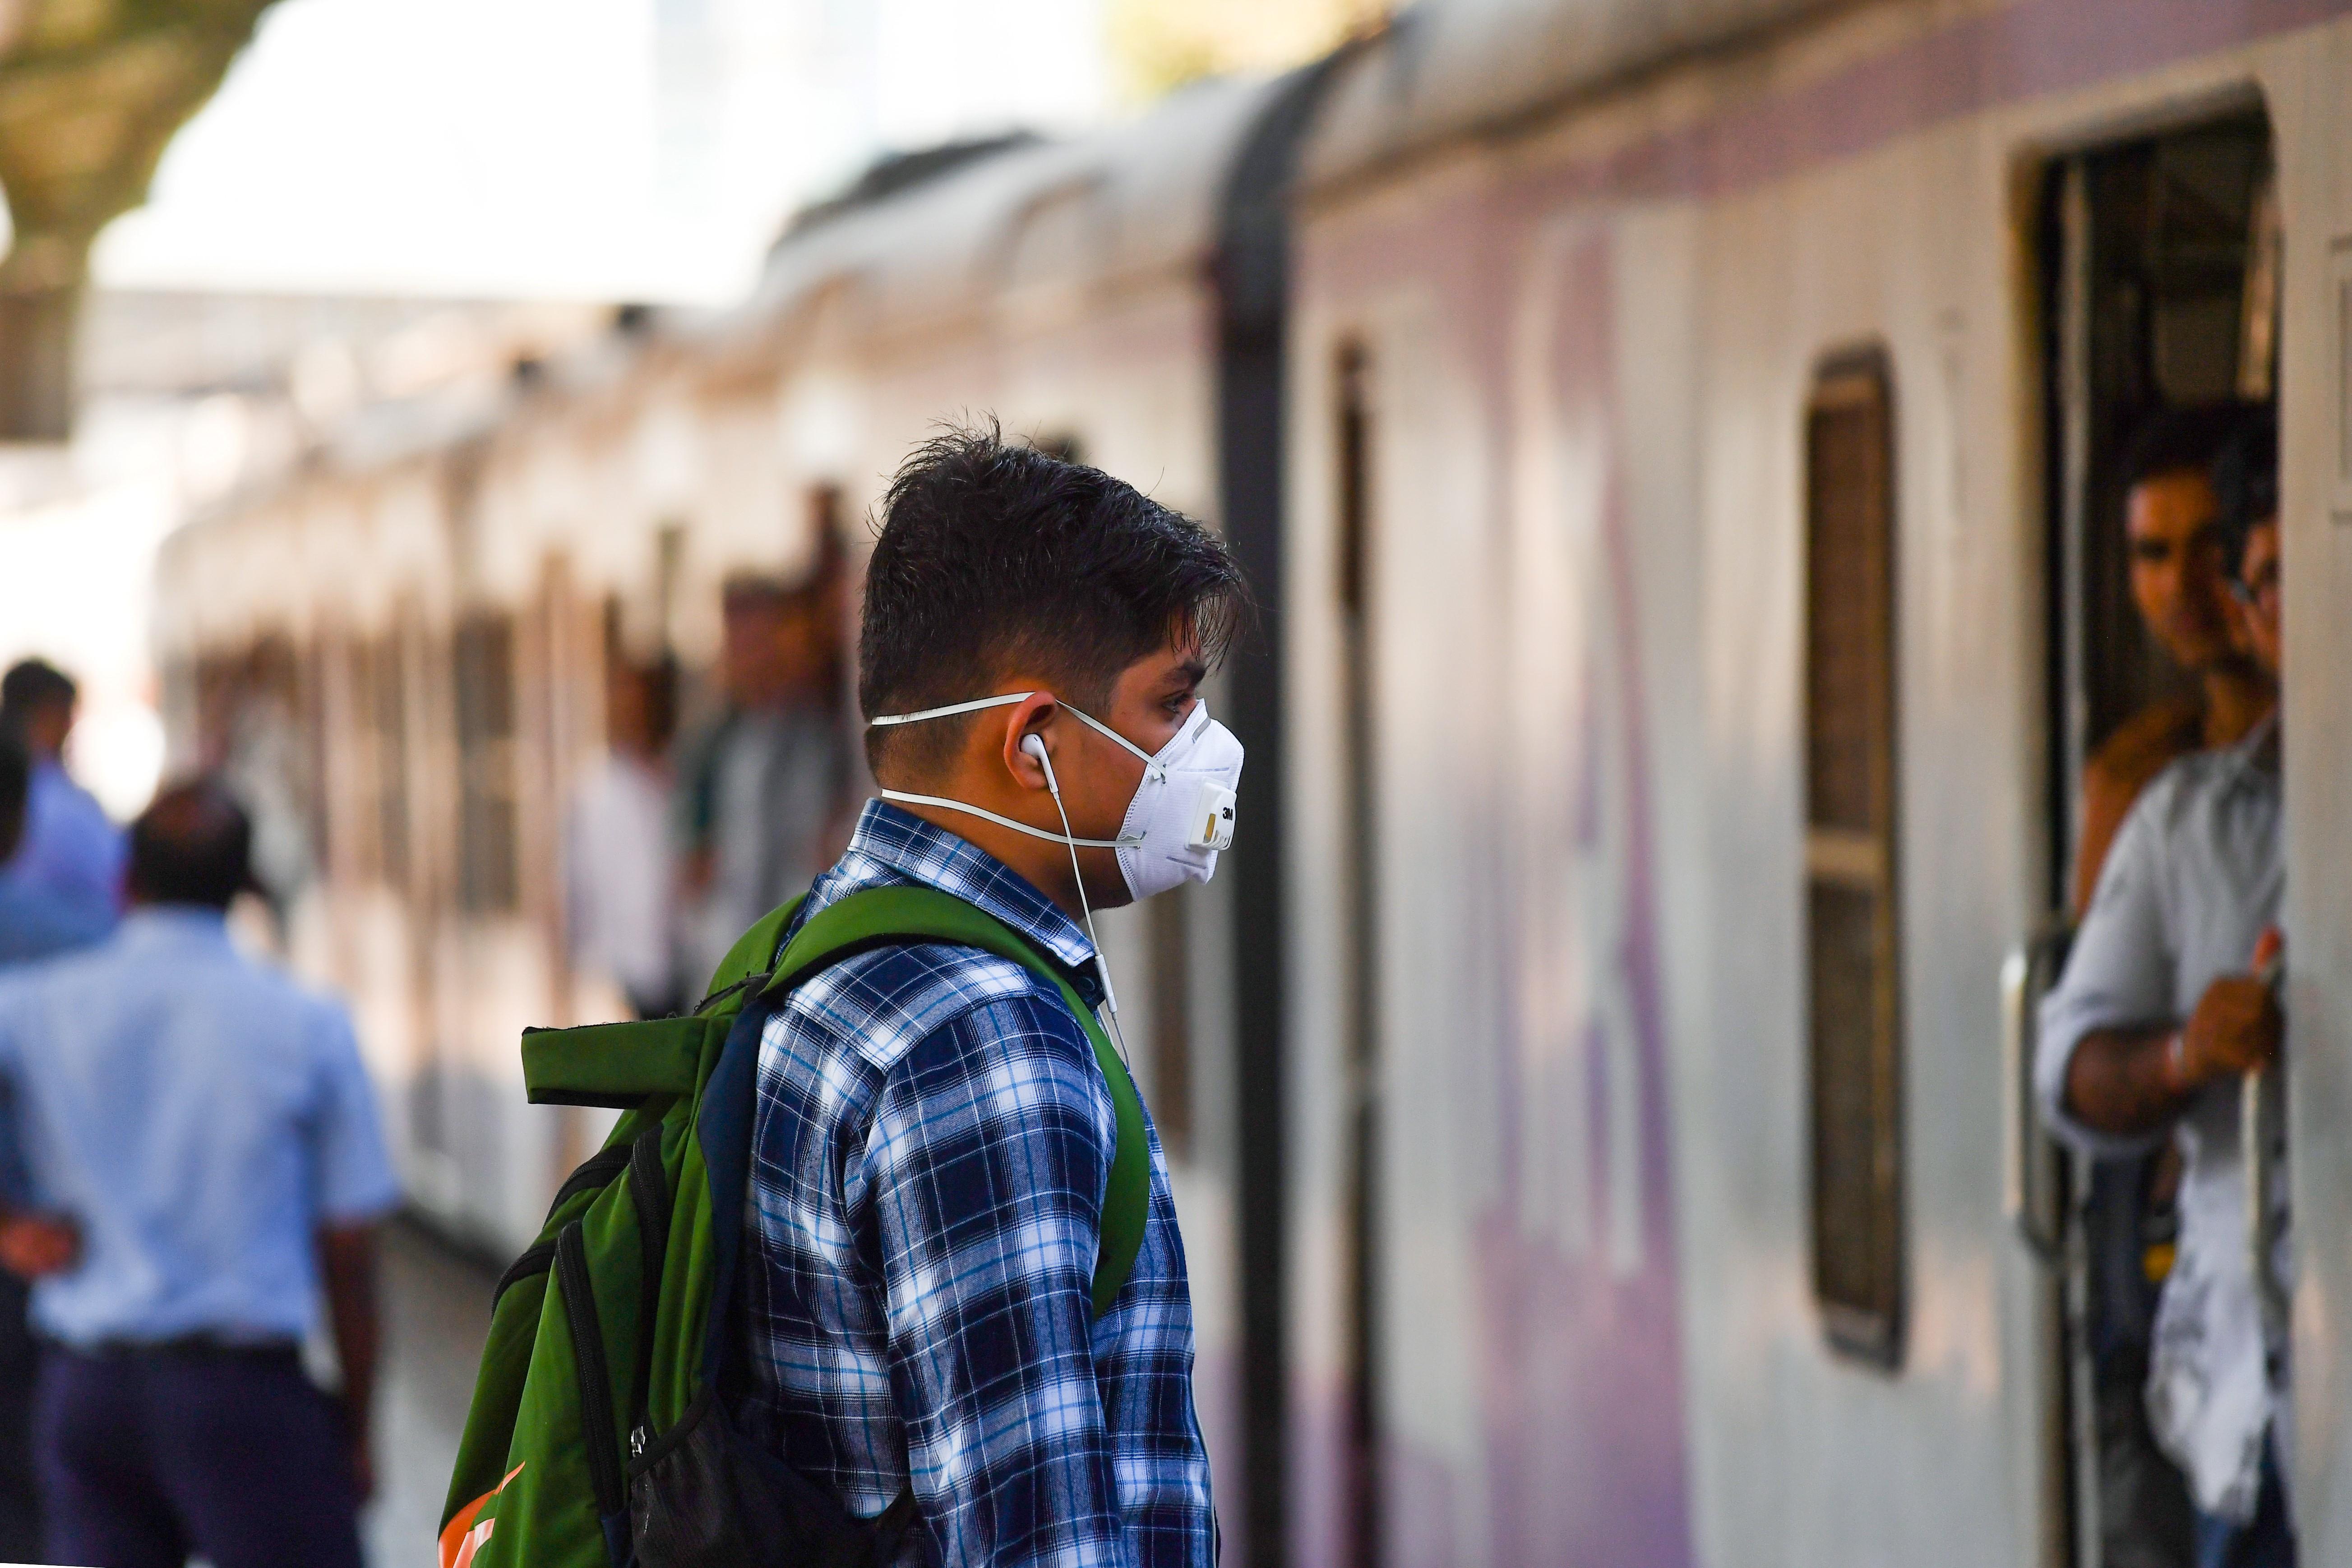 India suspends tourist visas until April 15 amid COVID-19 scare